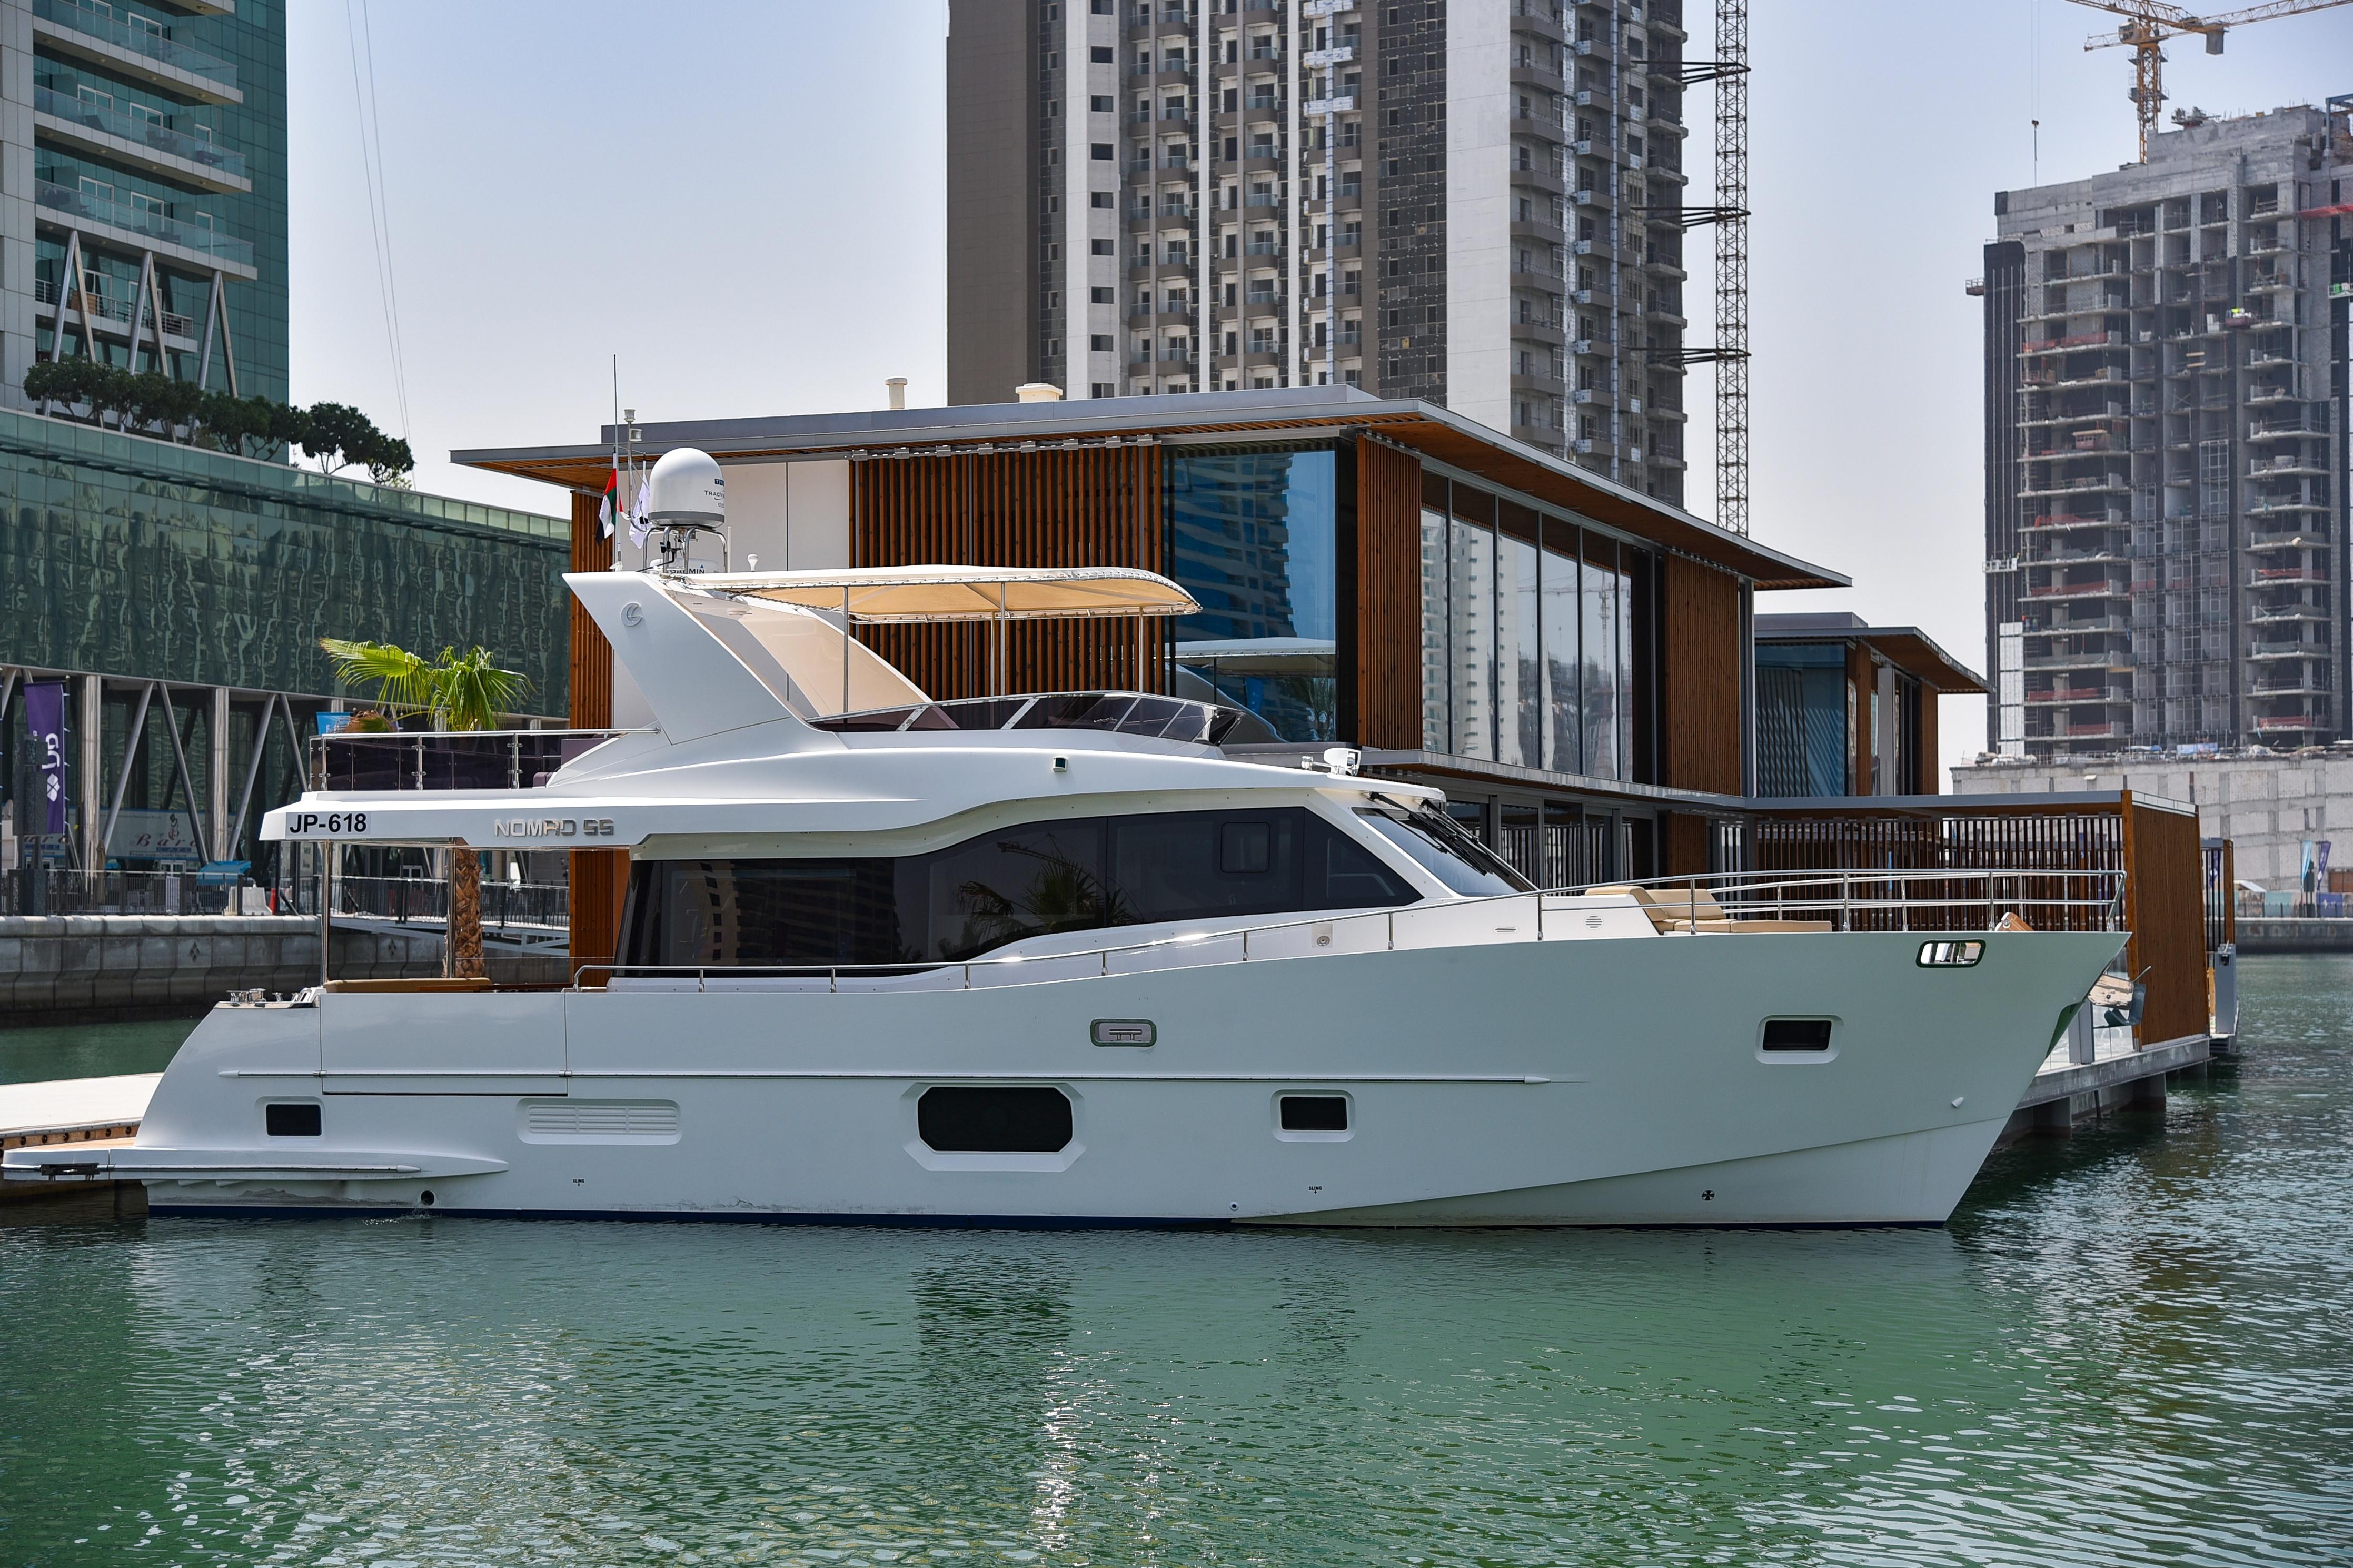 Gulf Craft's Nomad 65, Marasi Business Bay